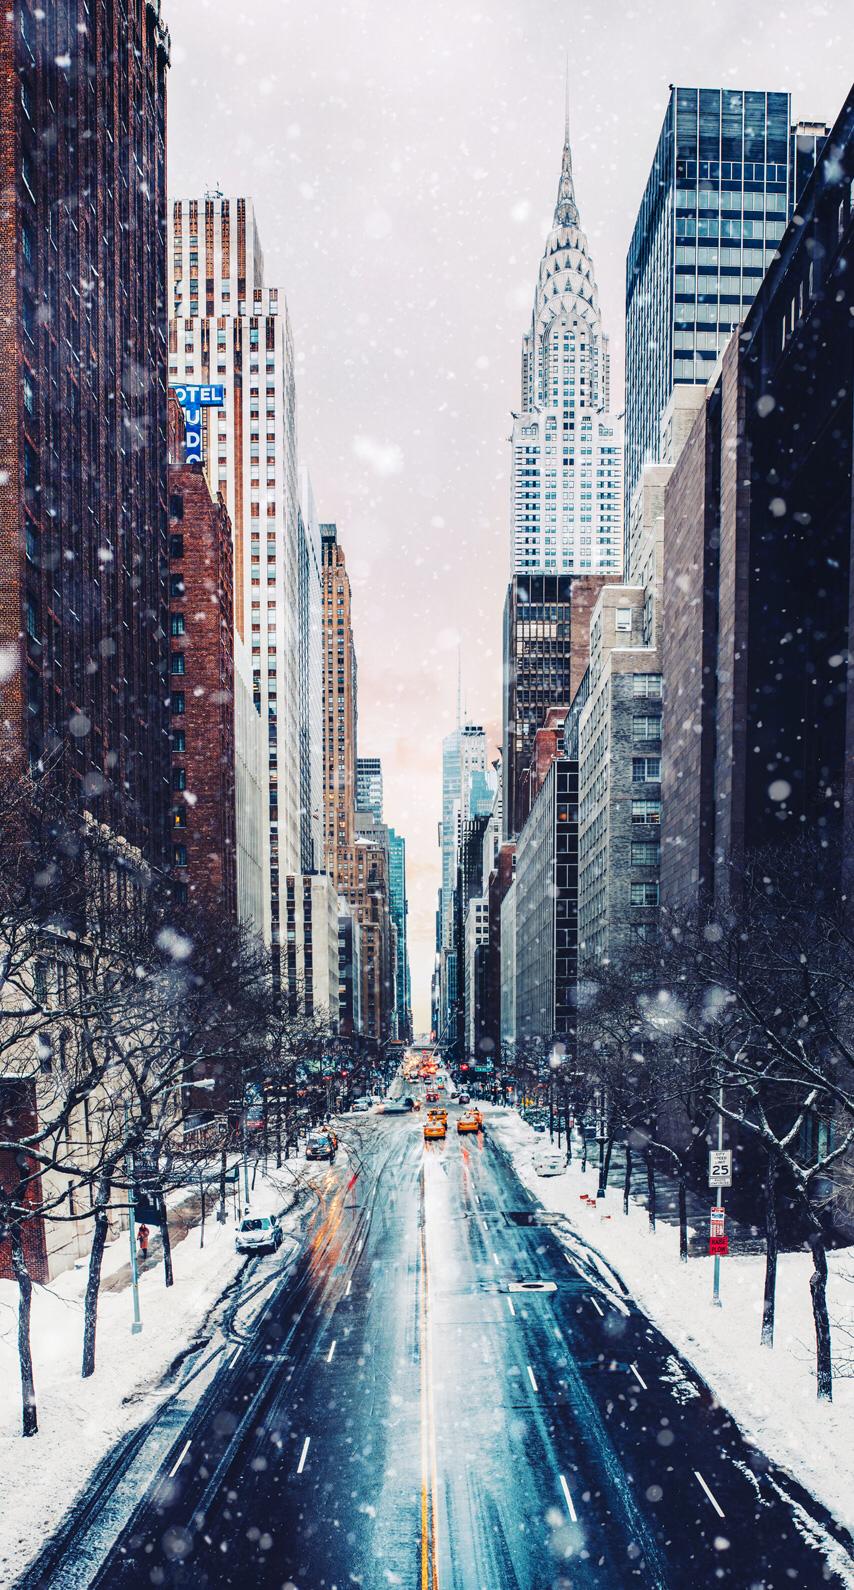 New York Hd - fondo de pantalla